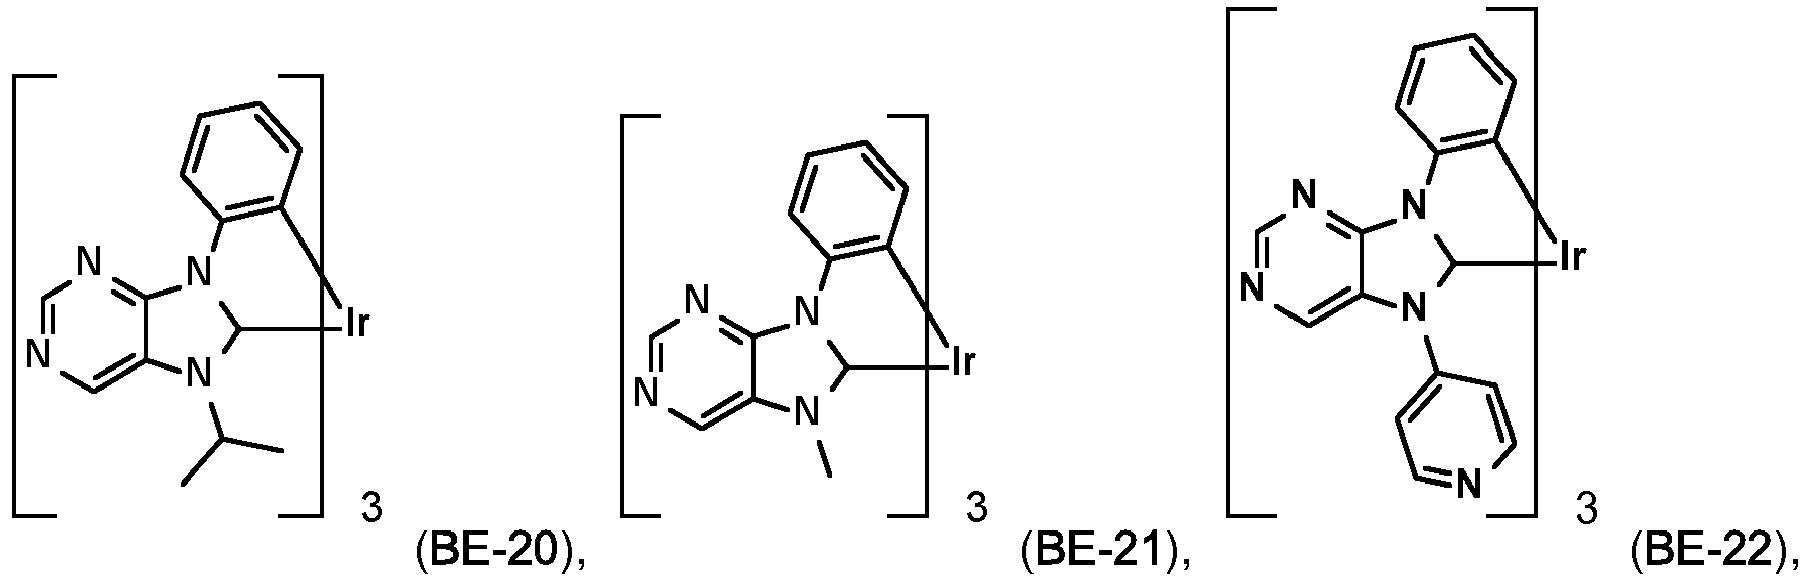 Figure imgb0759